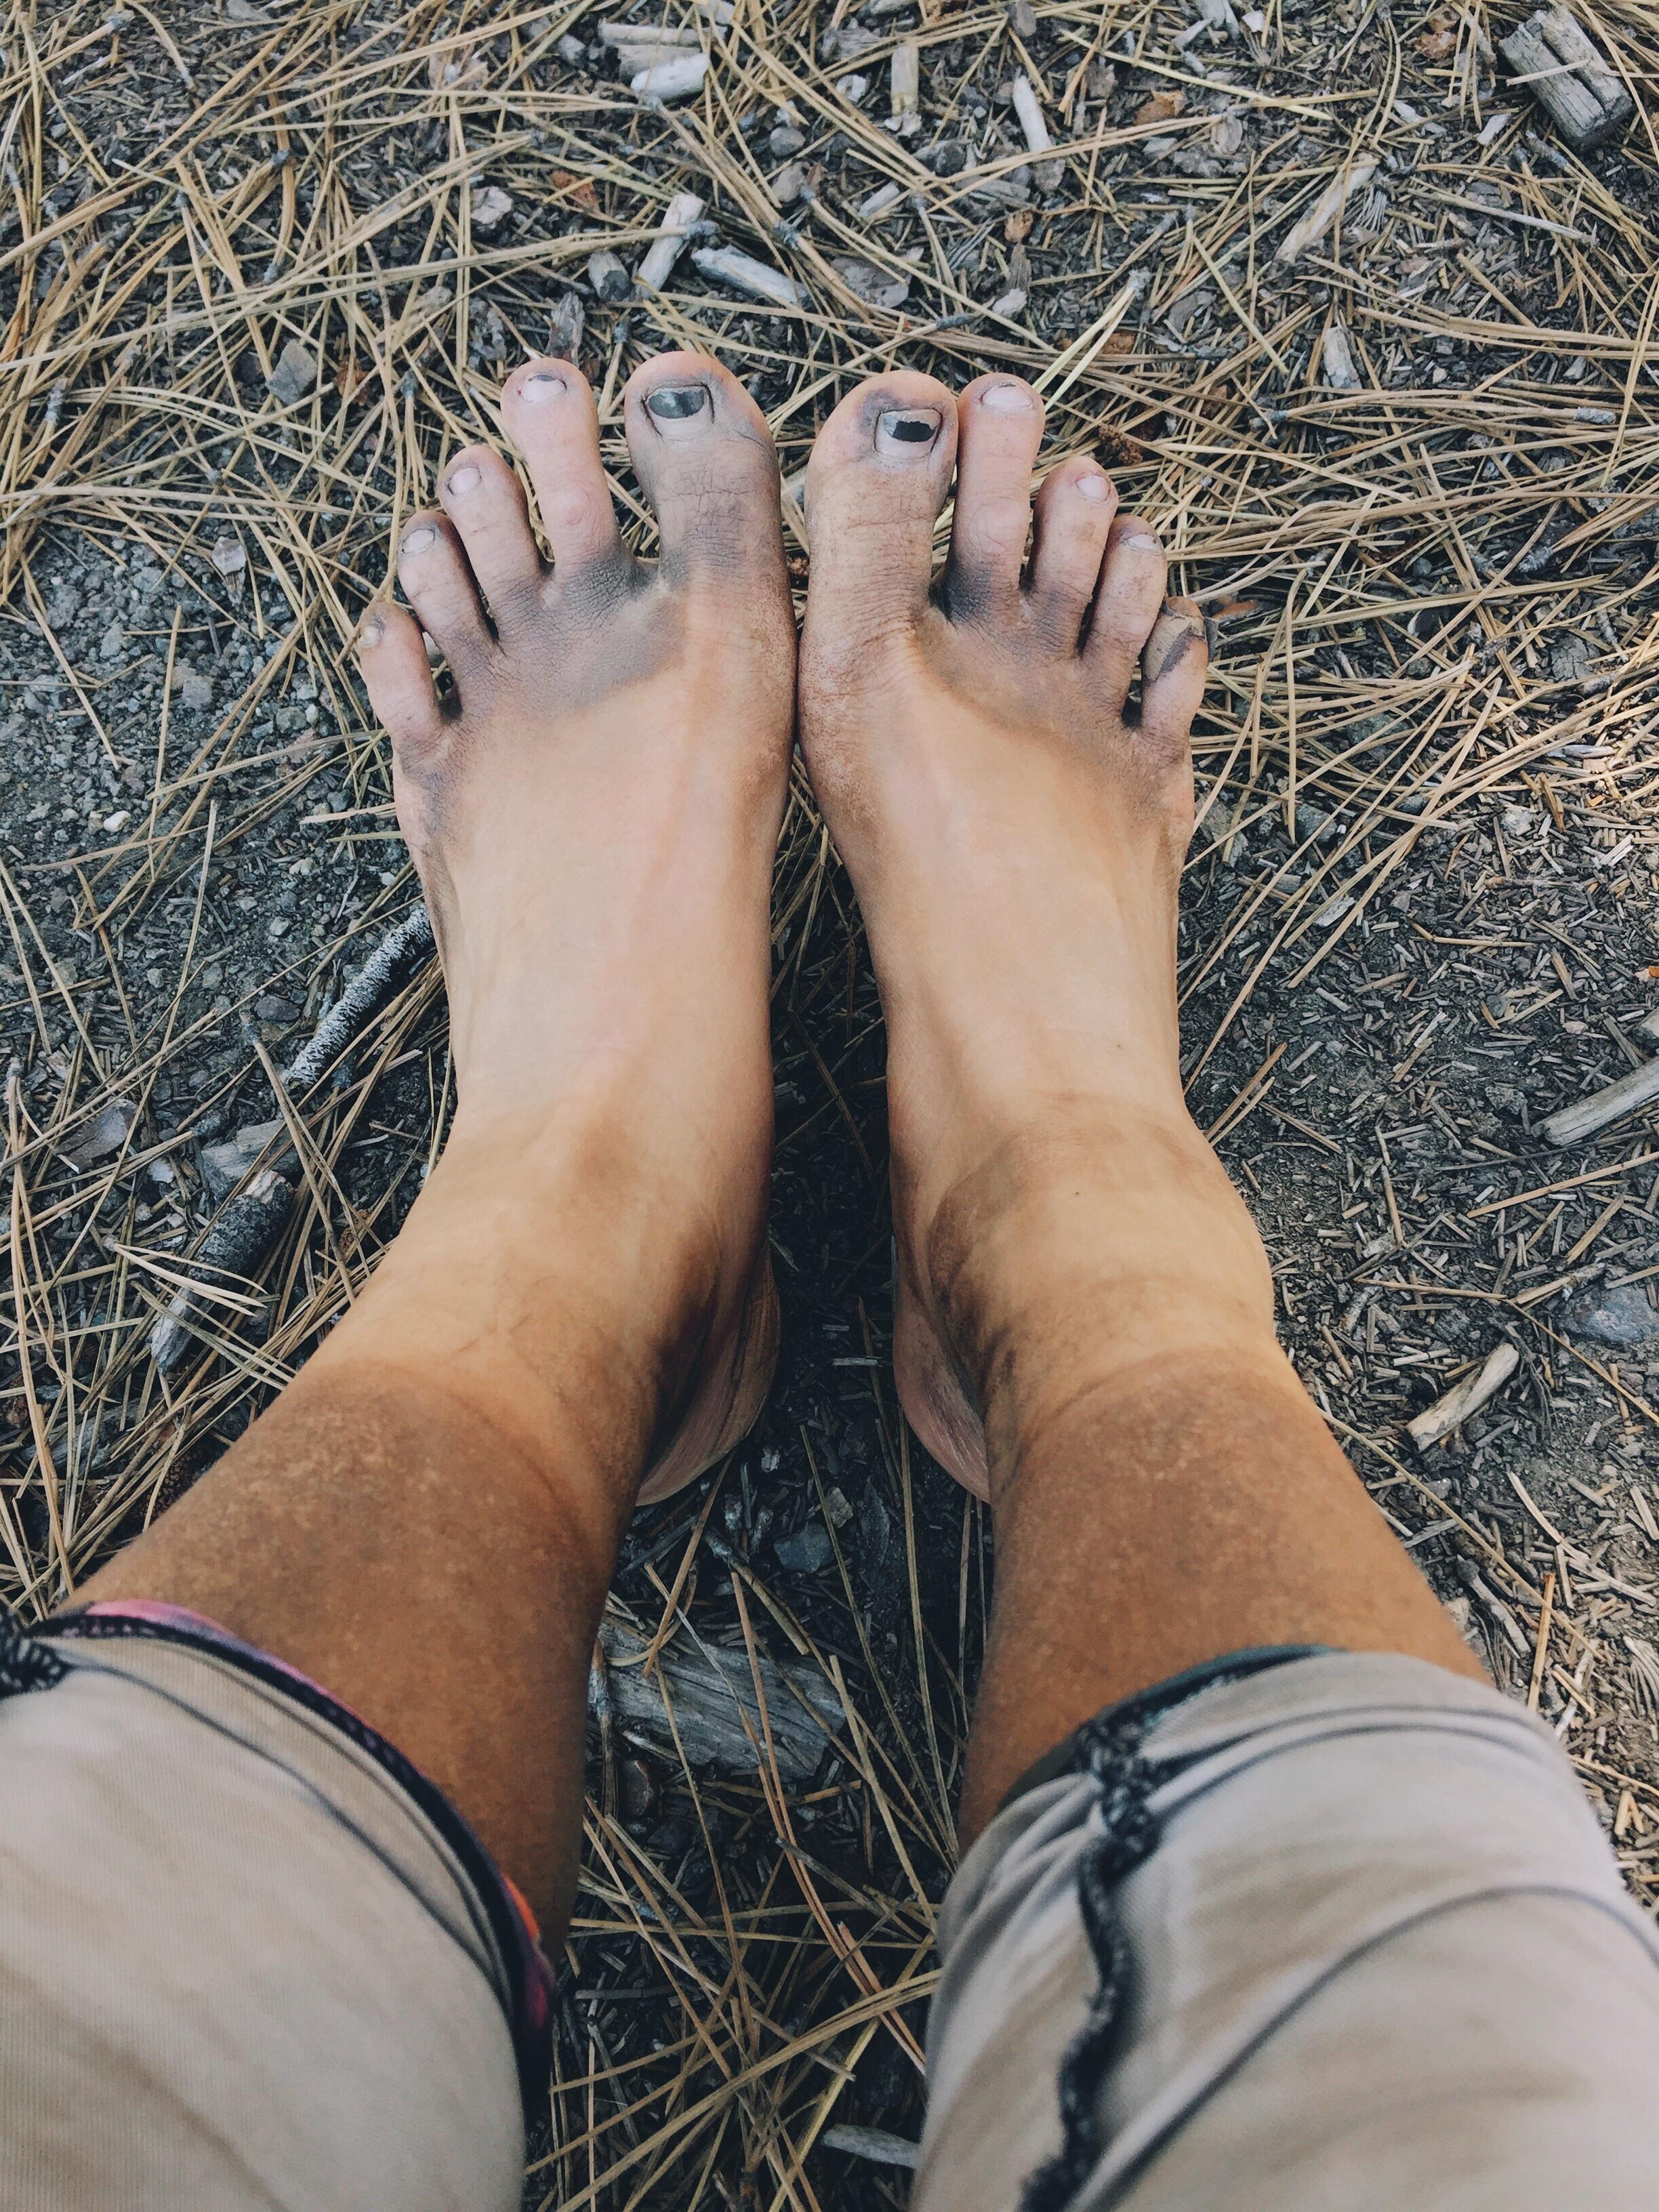 My feet so dirty! Six days no shower.